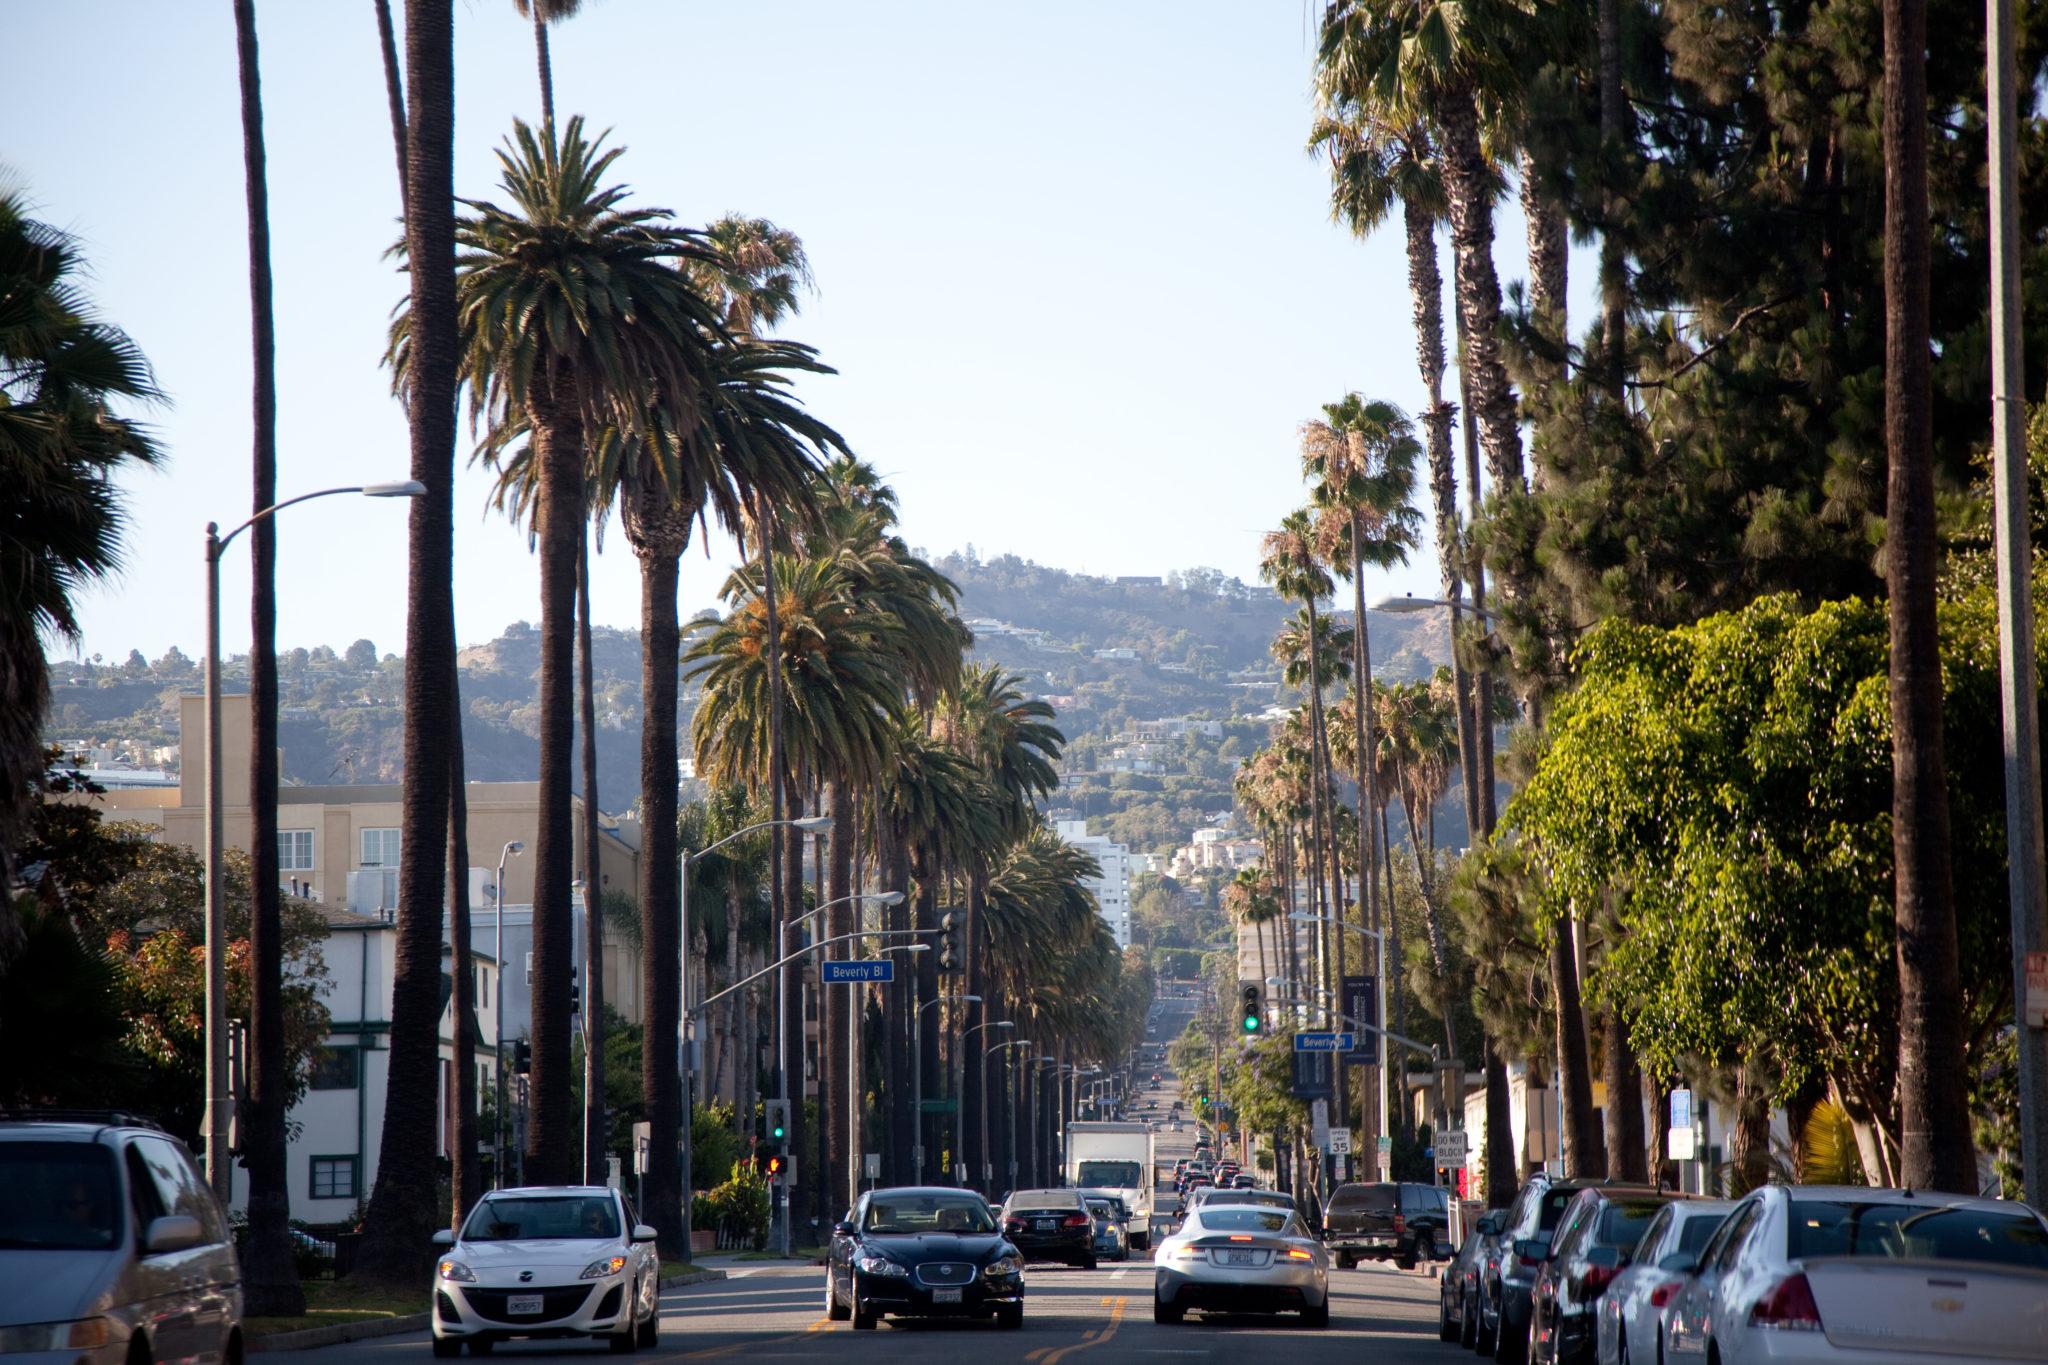 Stany z południa na północ. Los Angeles